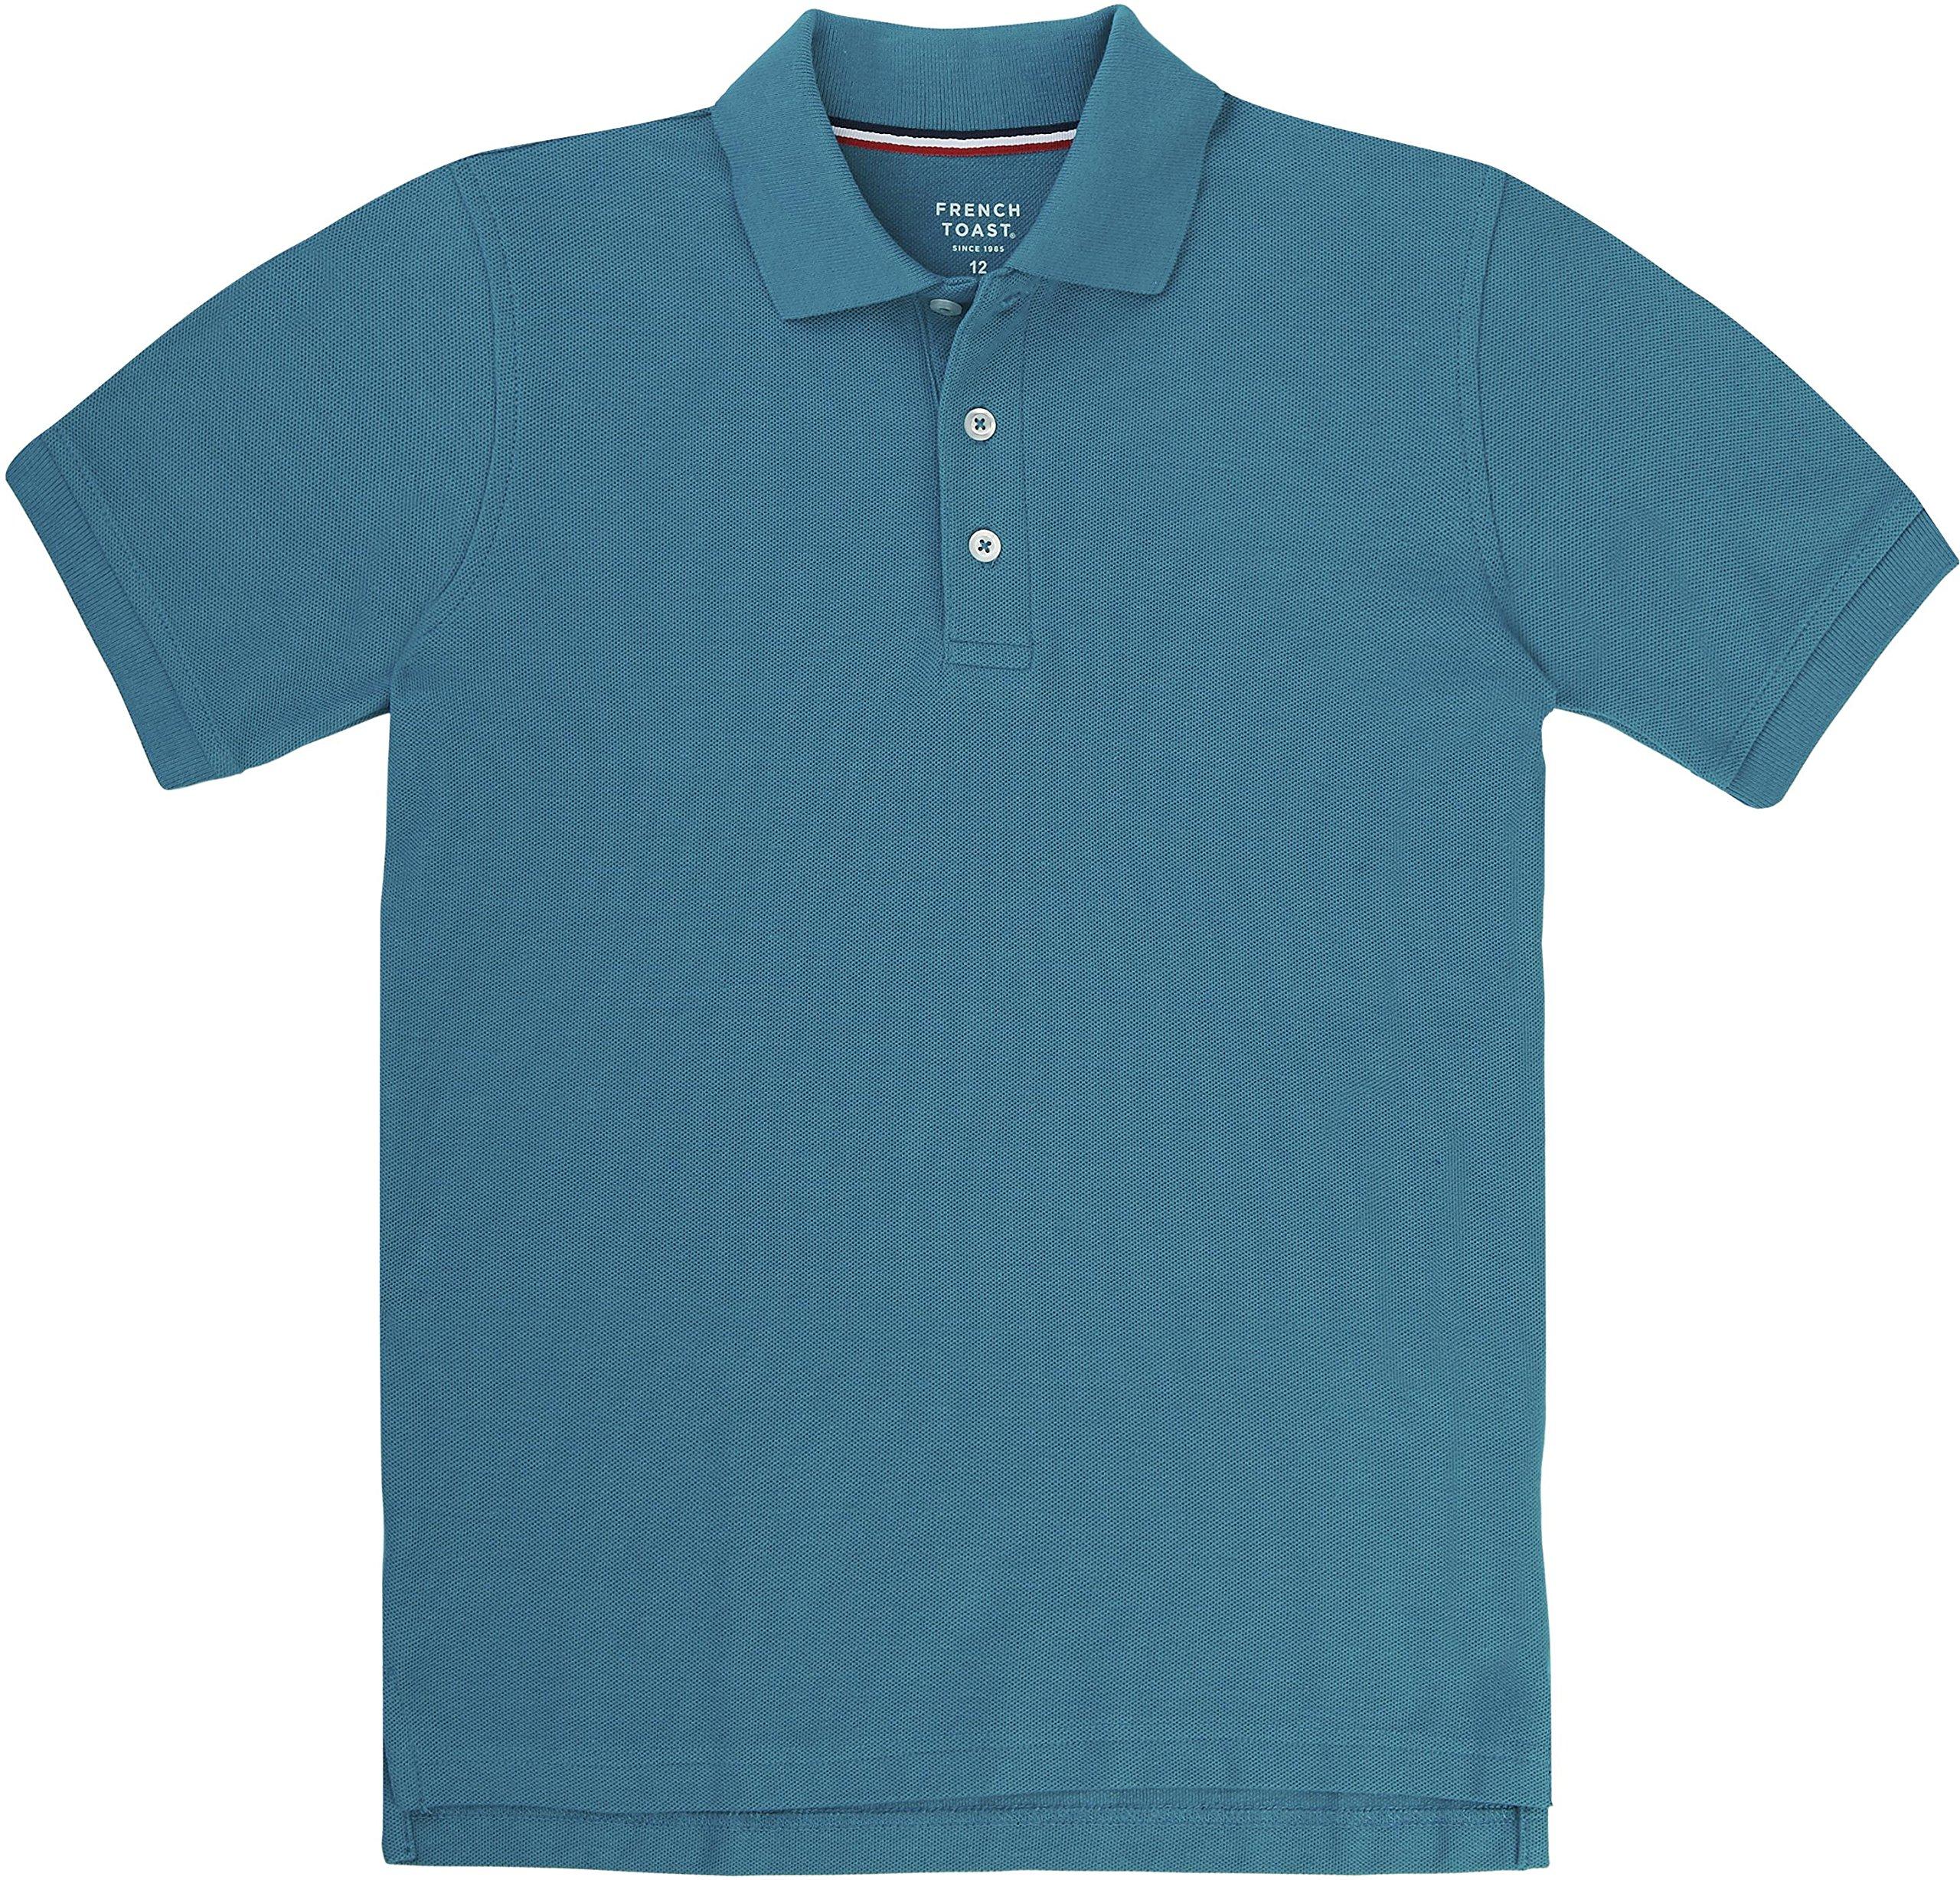 French Toast School Uniform Boys Short Sleeve Pique Polo Shirt, Teal, Medium (8)